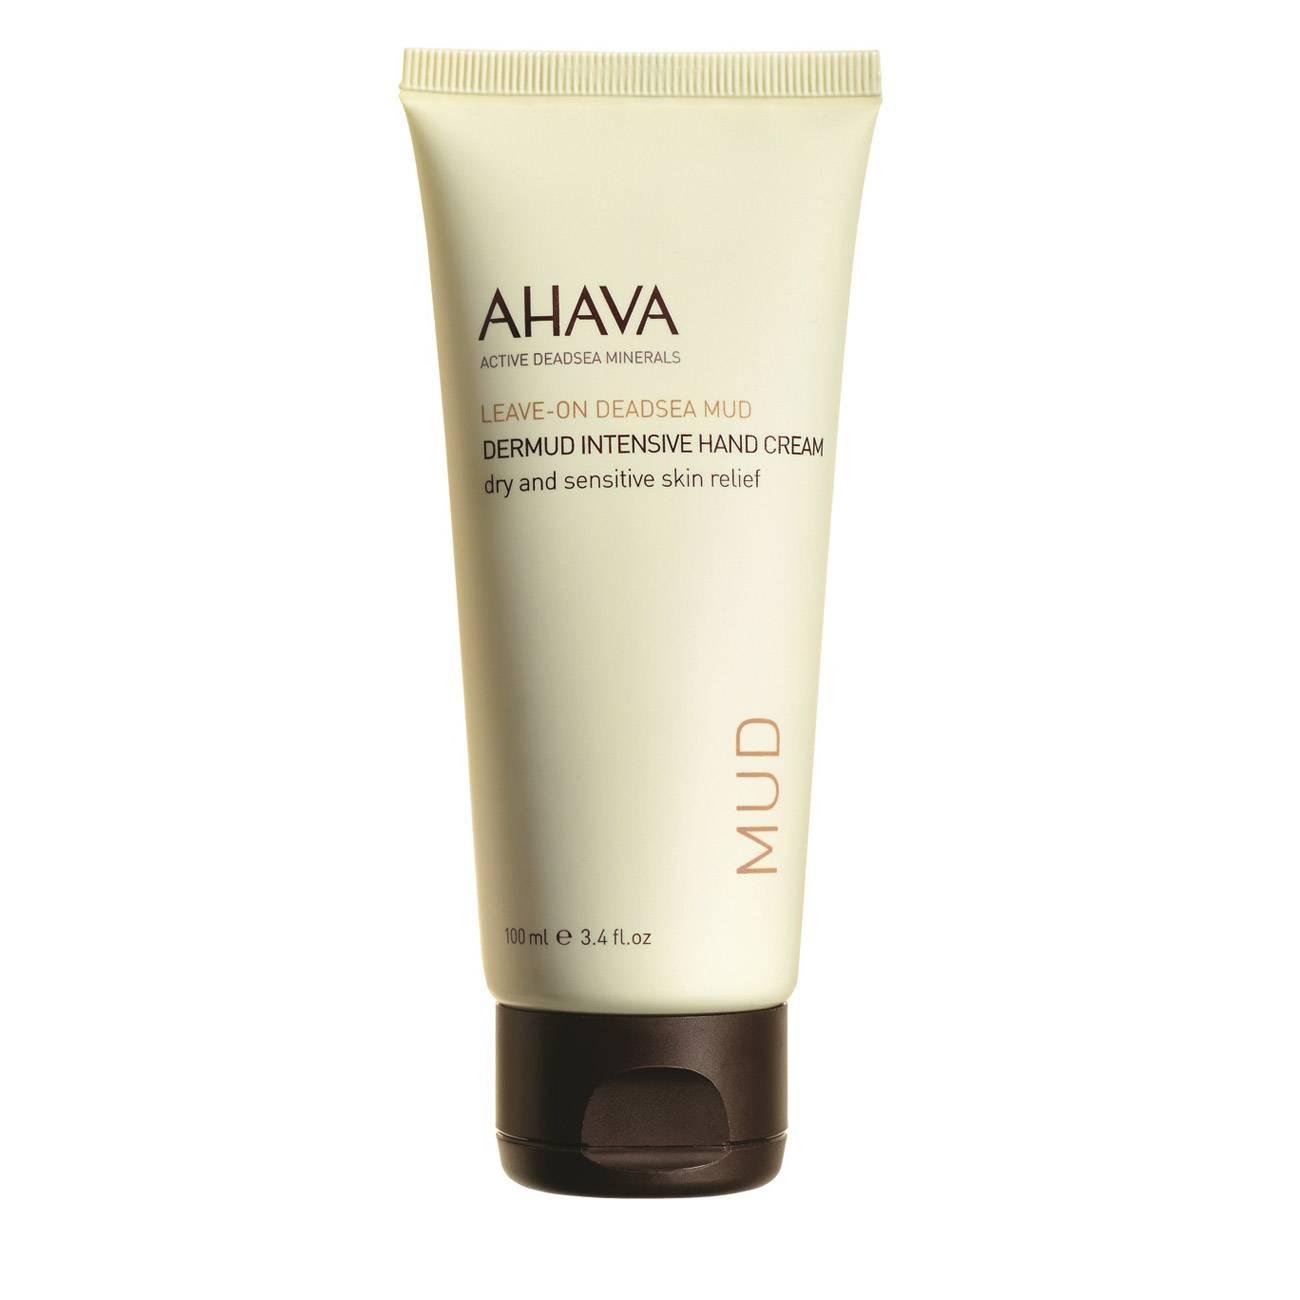 Leave-On Deadsea Mud Dermud Intensive Hand Cream 100 Ml Ahava imagine 2021 bestvalue.eu